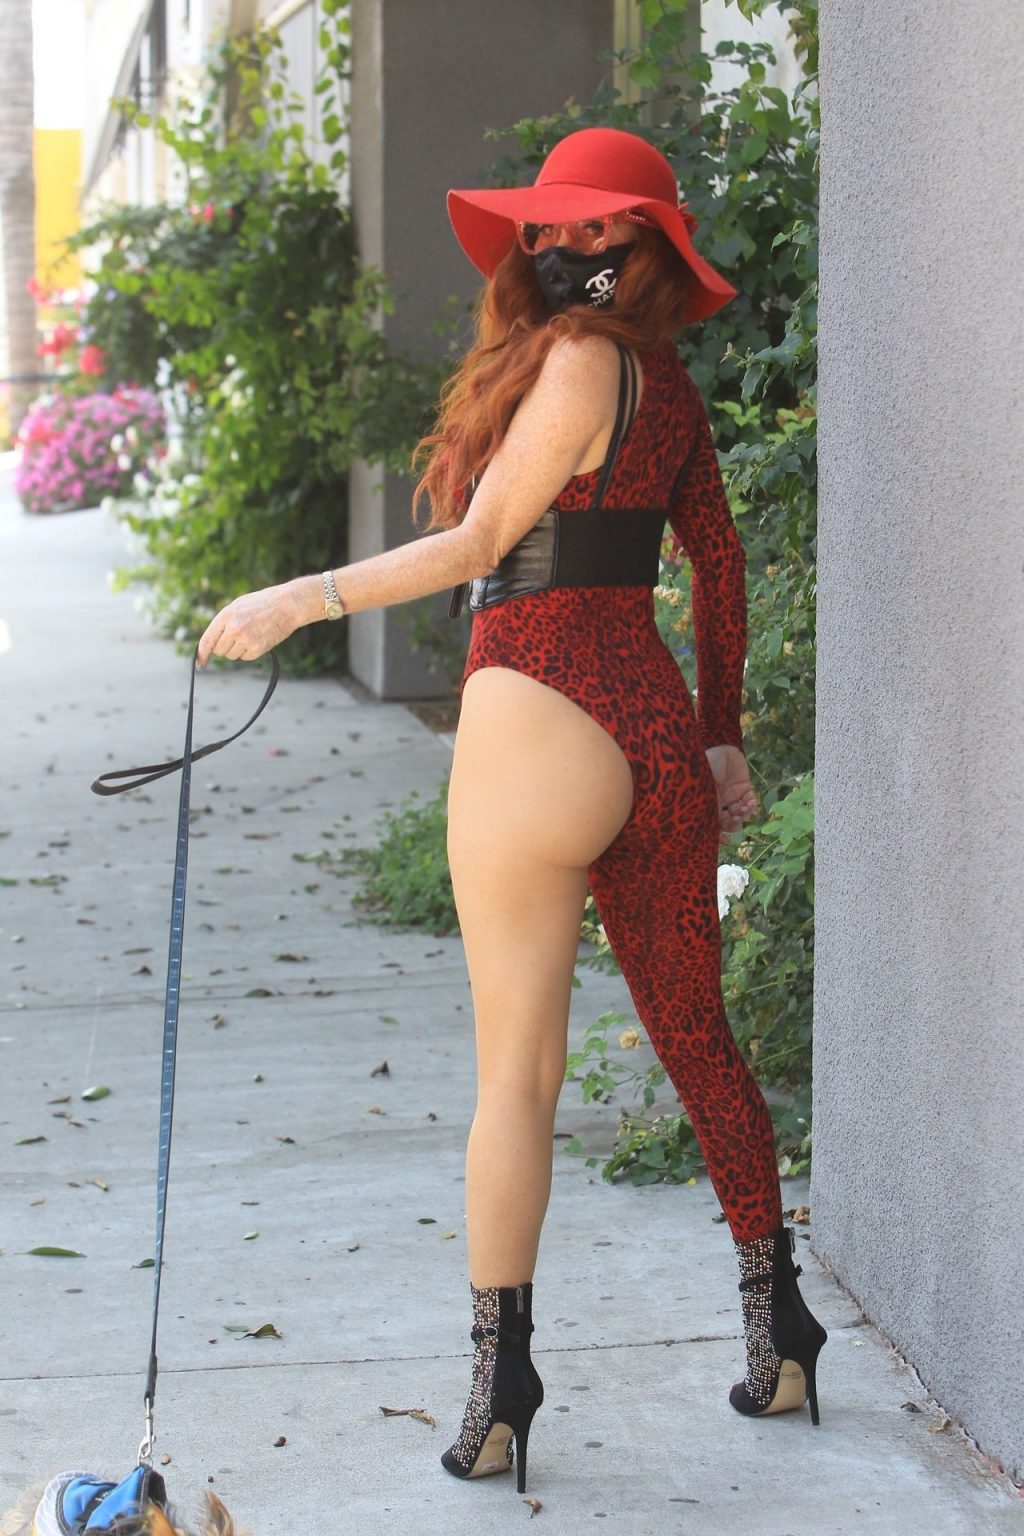 Phoebe Price Walks Her Dog in Hollywood (17 Photos)